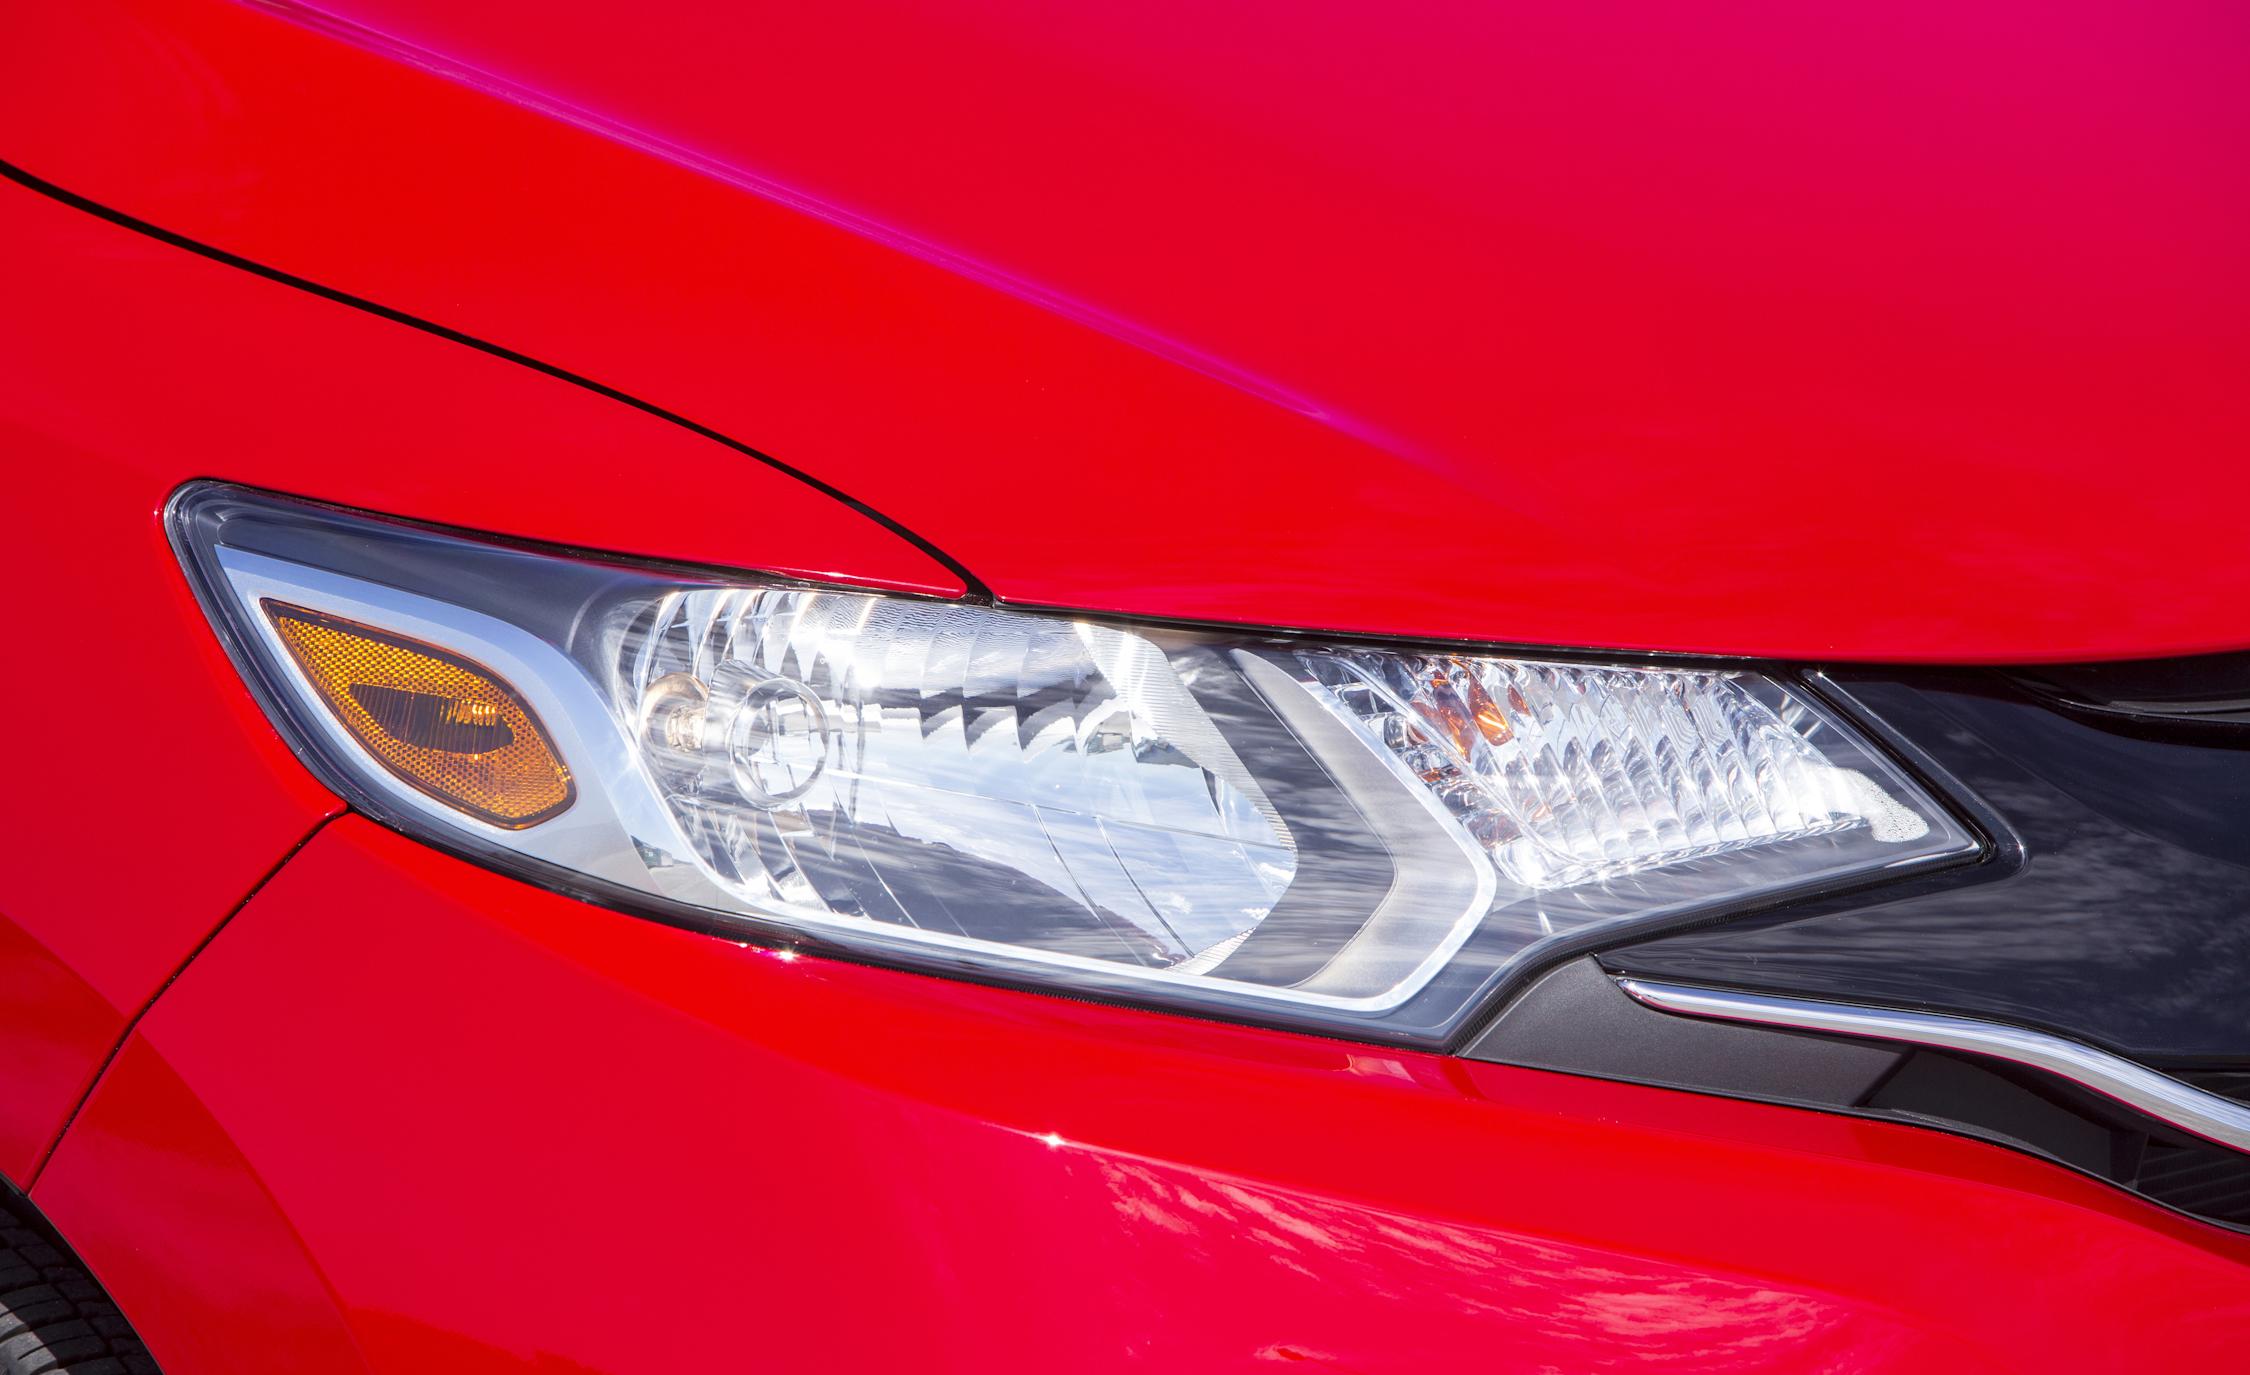 2015 Honda Fit Exterior Headlight